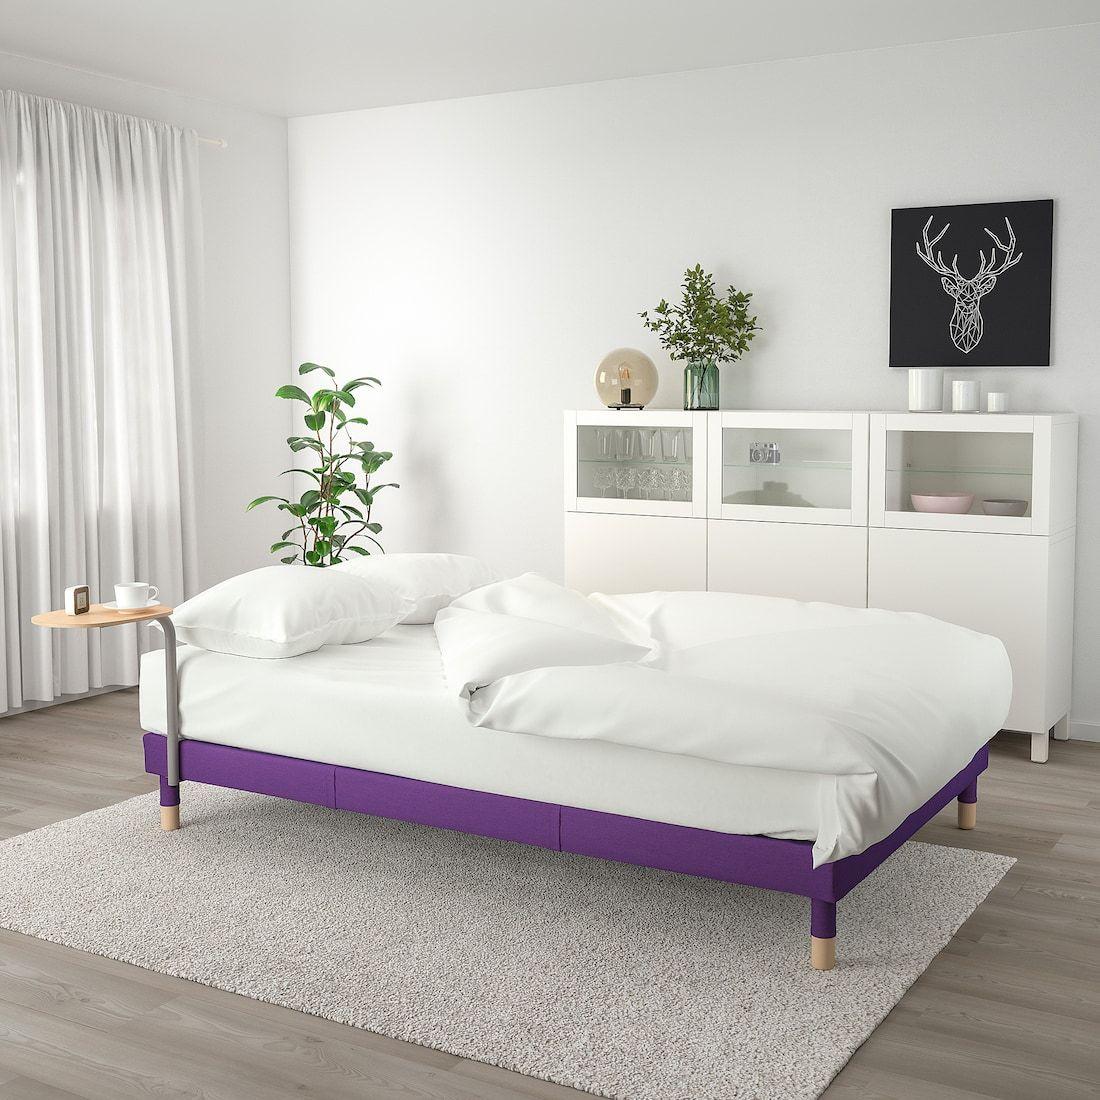 Flottebo Sleeper Sofa With Side Table Vissle Purple 47 1 4 Sofa Bed Frame Sleeper Sofa Sofa Frame